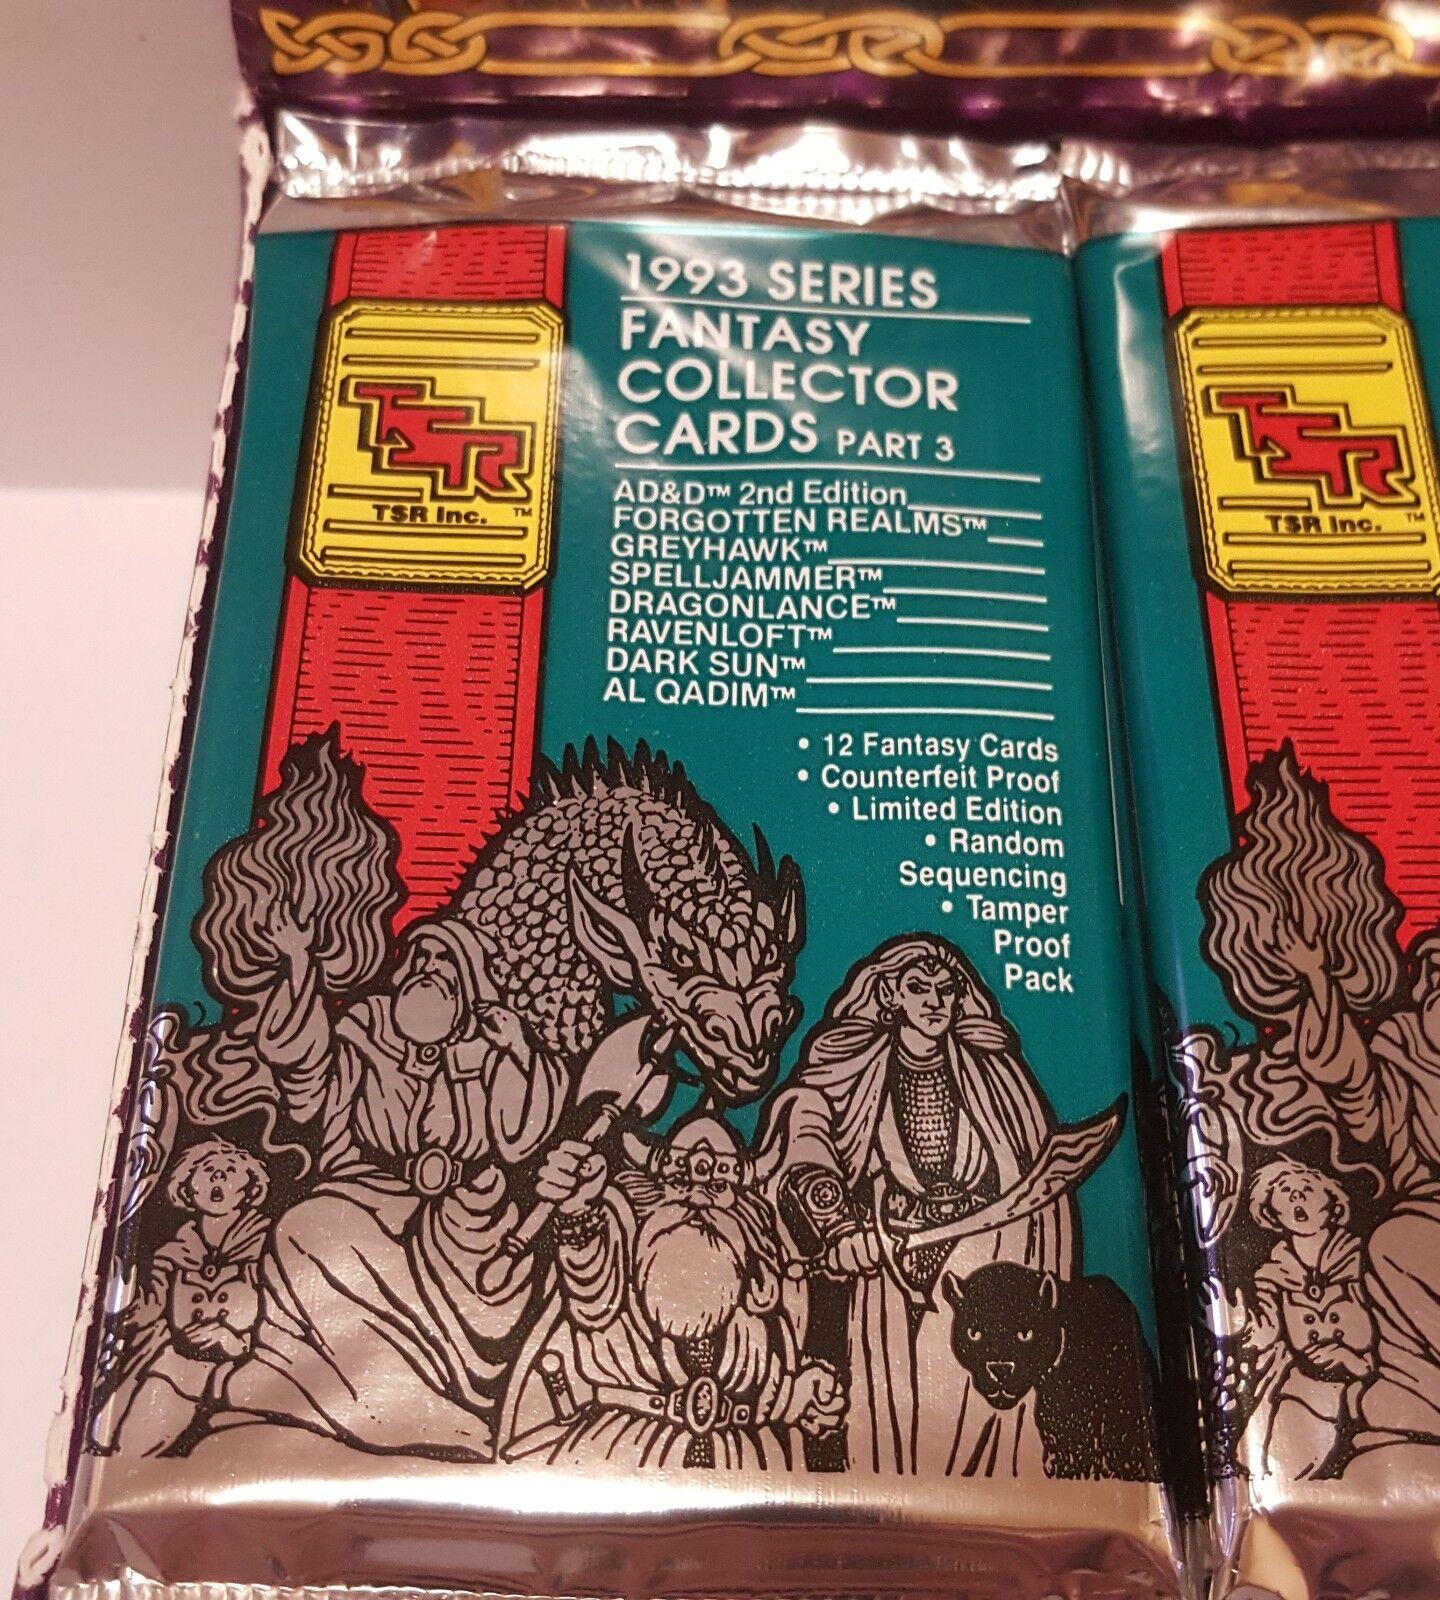 10 TSR 1993 AD &D 2 a EDISEringarKOLLECTOR bilDS.DEL 3 Advanced Dungeons & drake